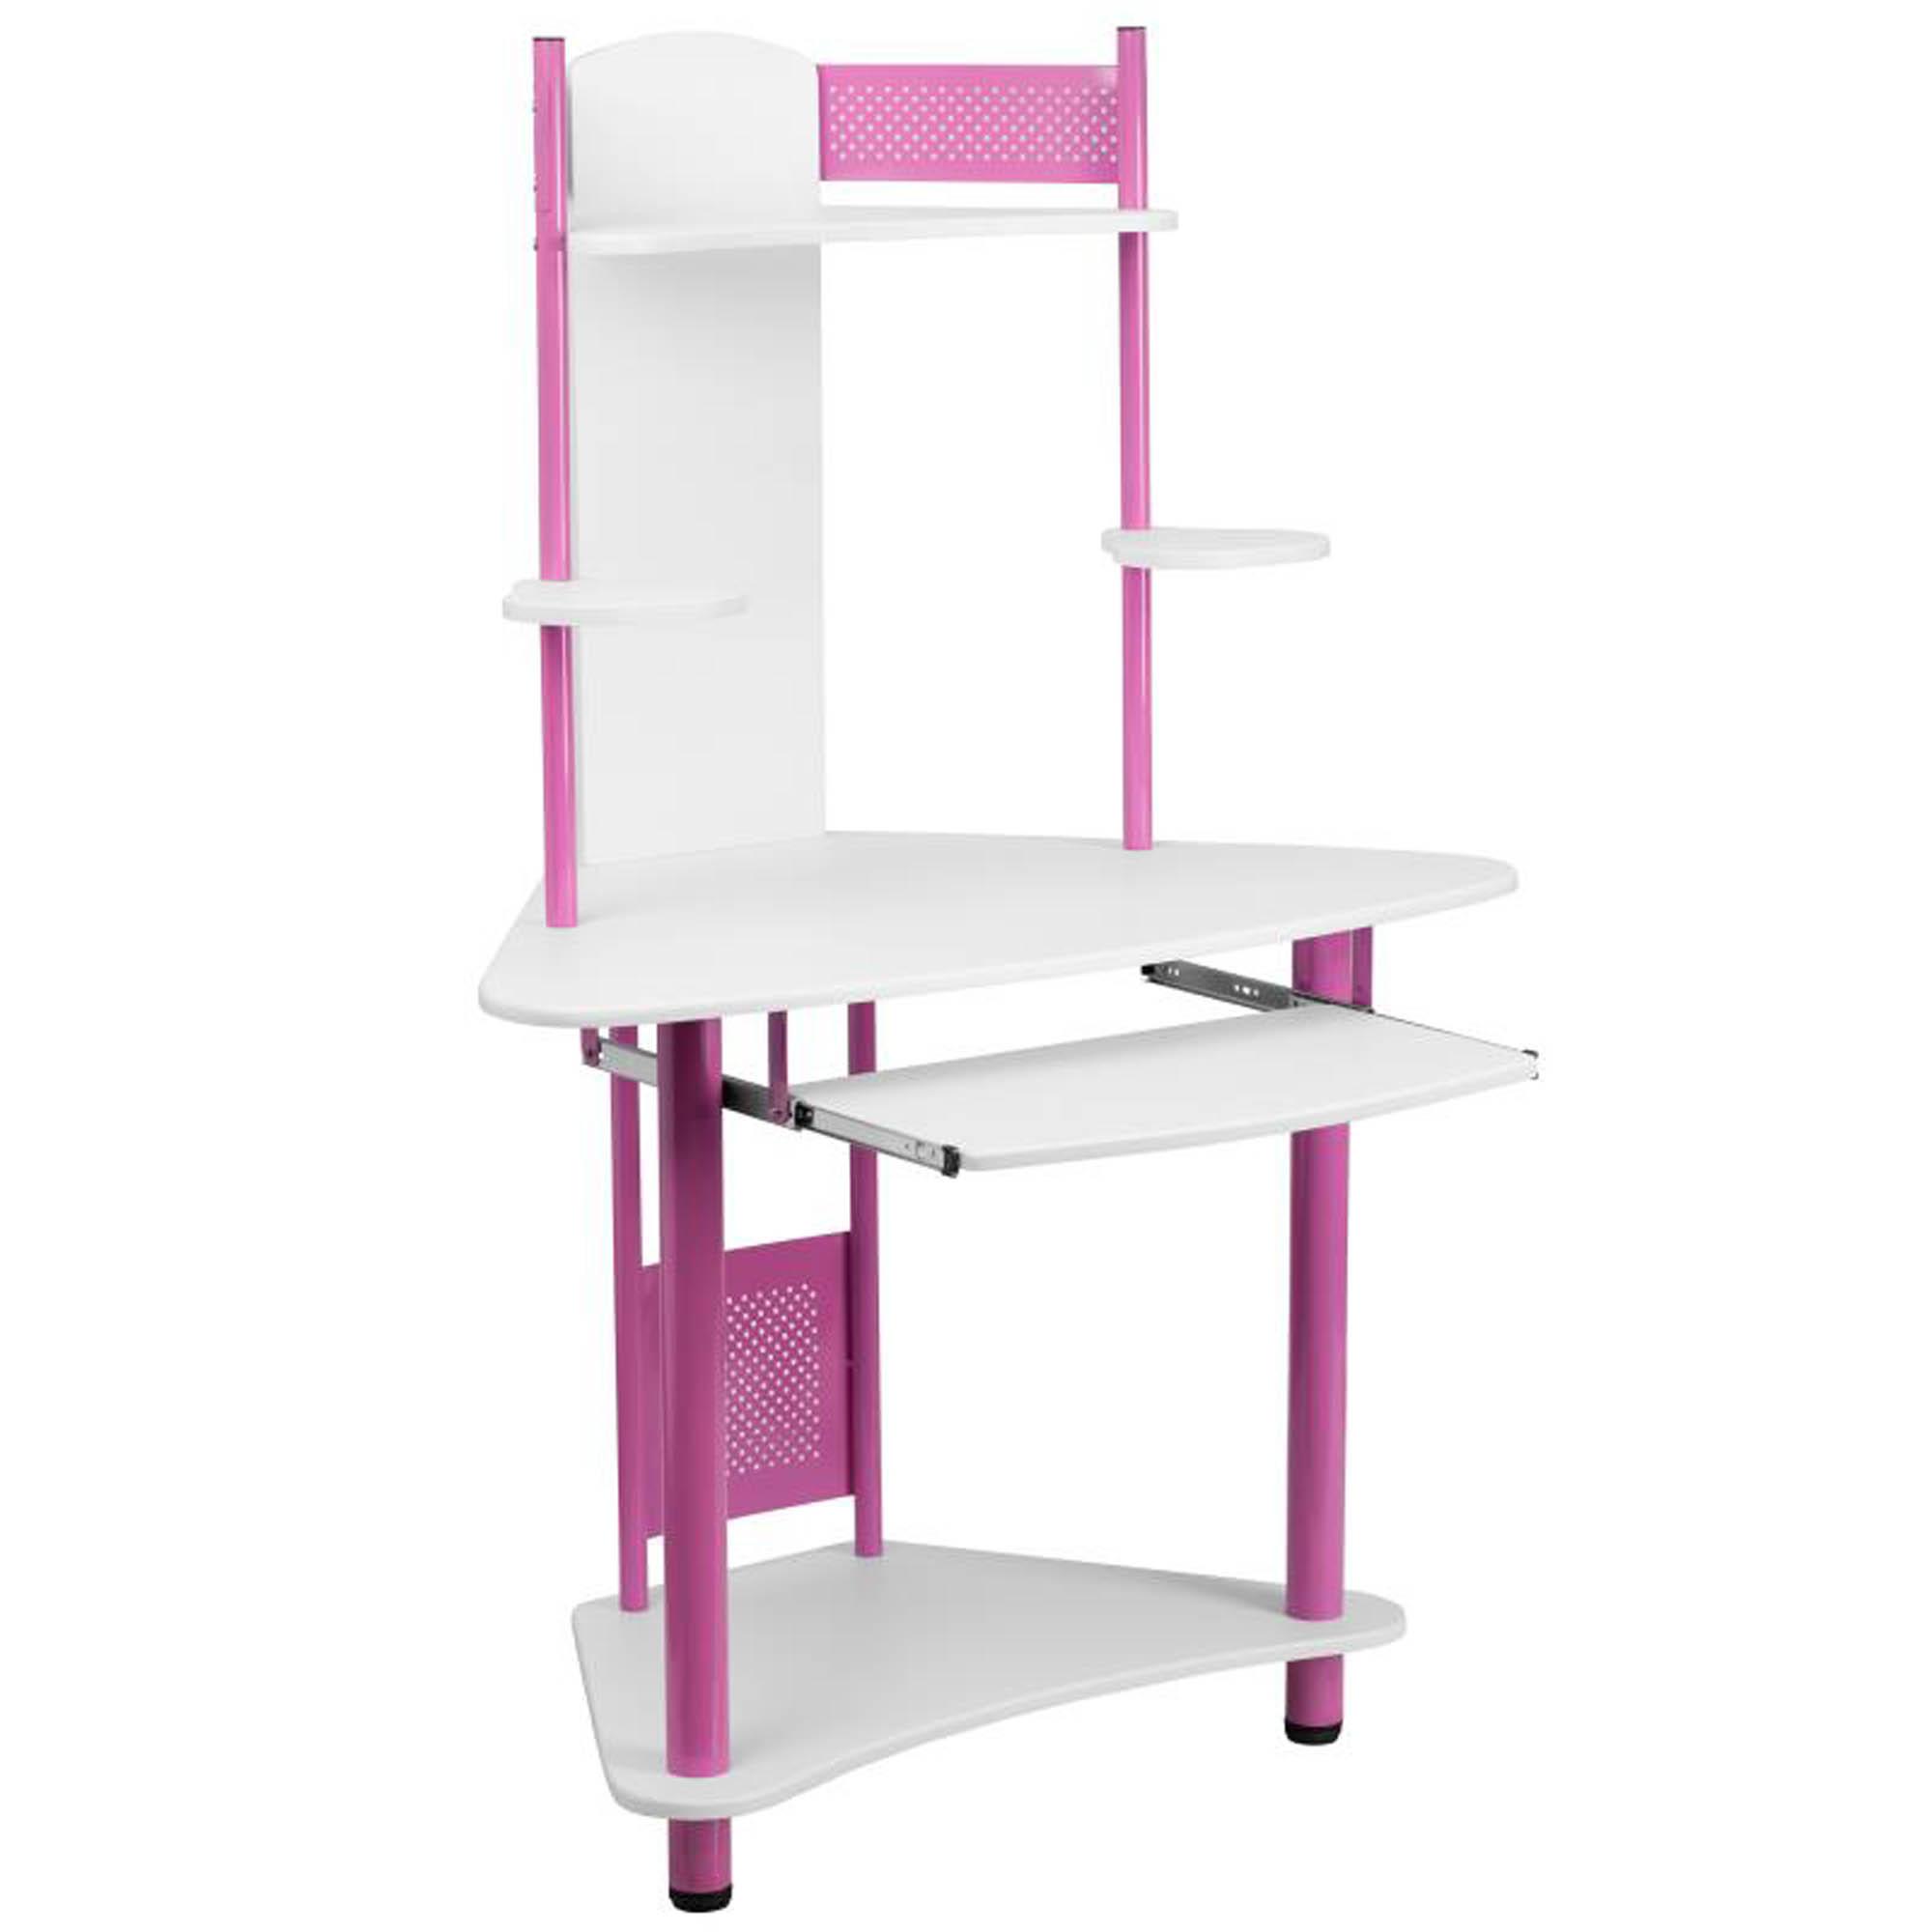 Offex NAN-JN-2705-PK-GG Pink Corner Computer Desk with Hutch